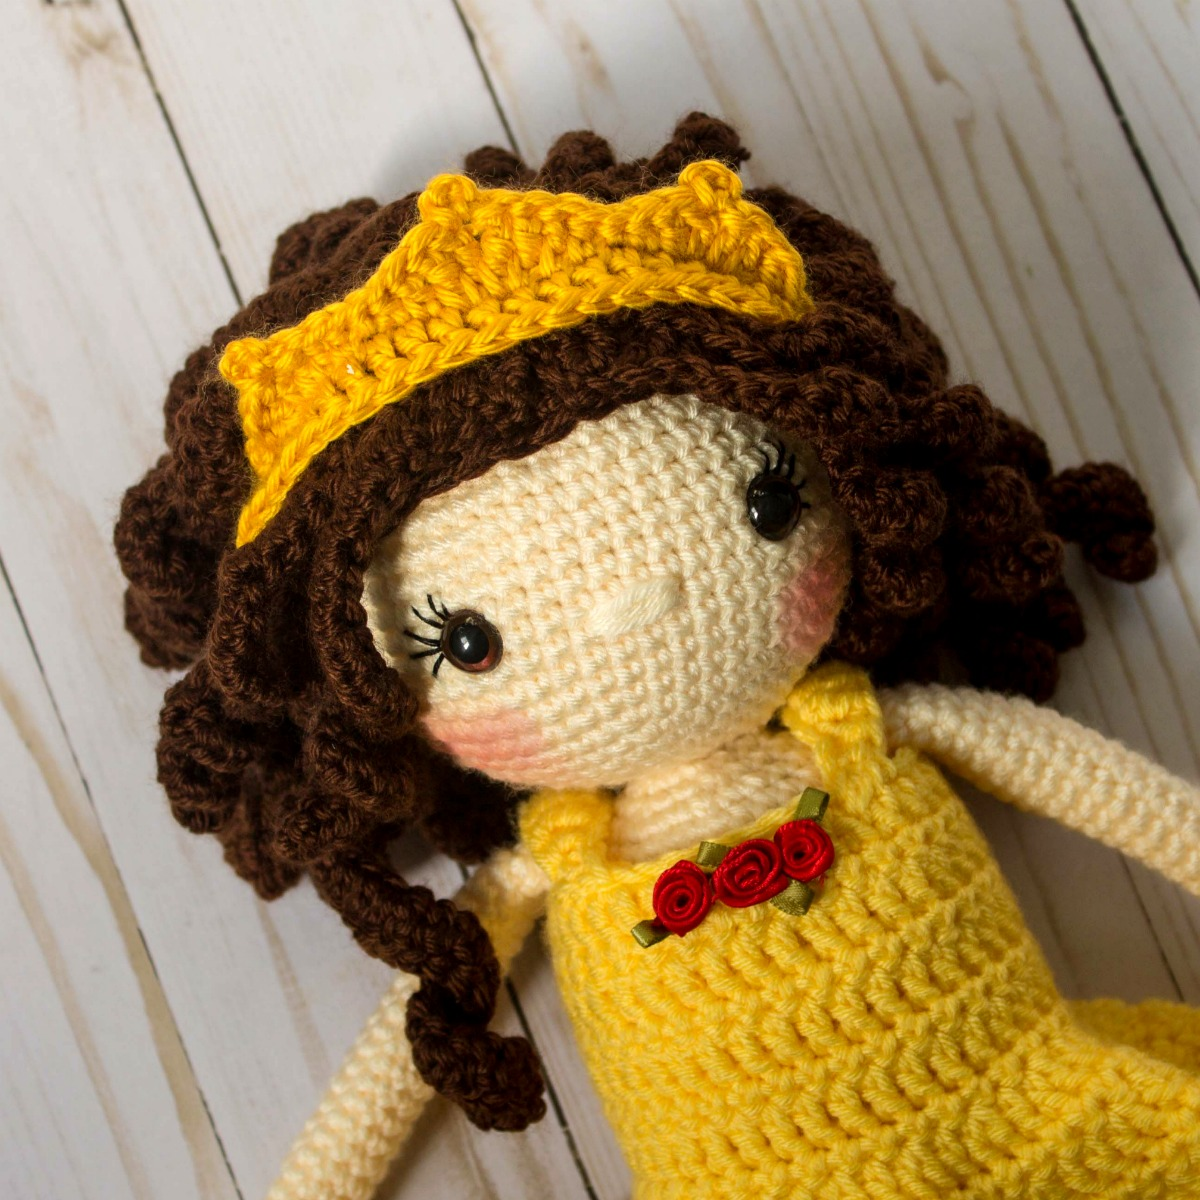 Crochet Princess Doll Pattern - thefriendlyredfox.com